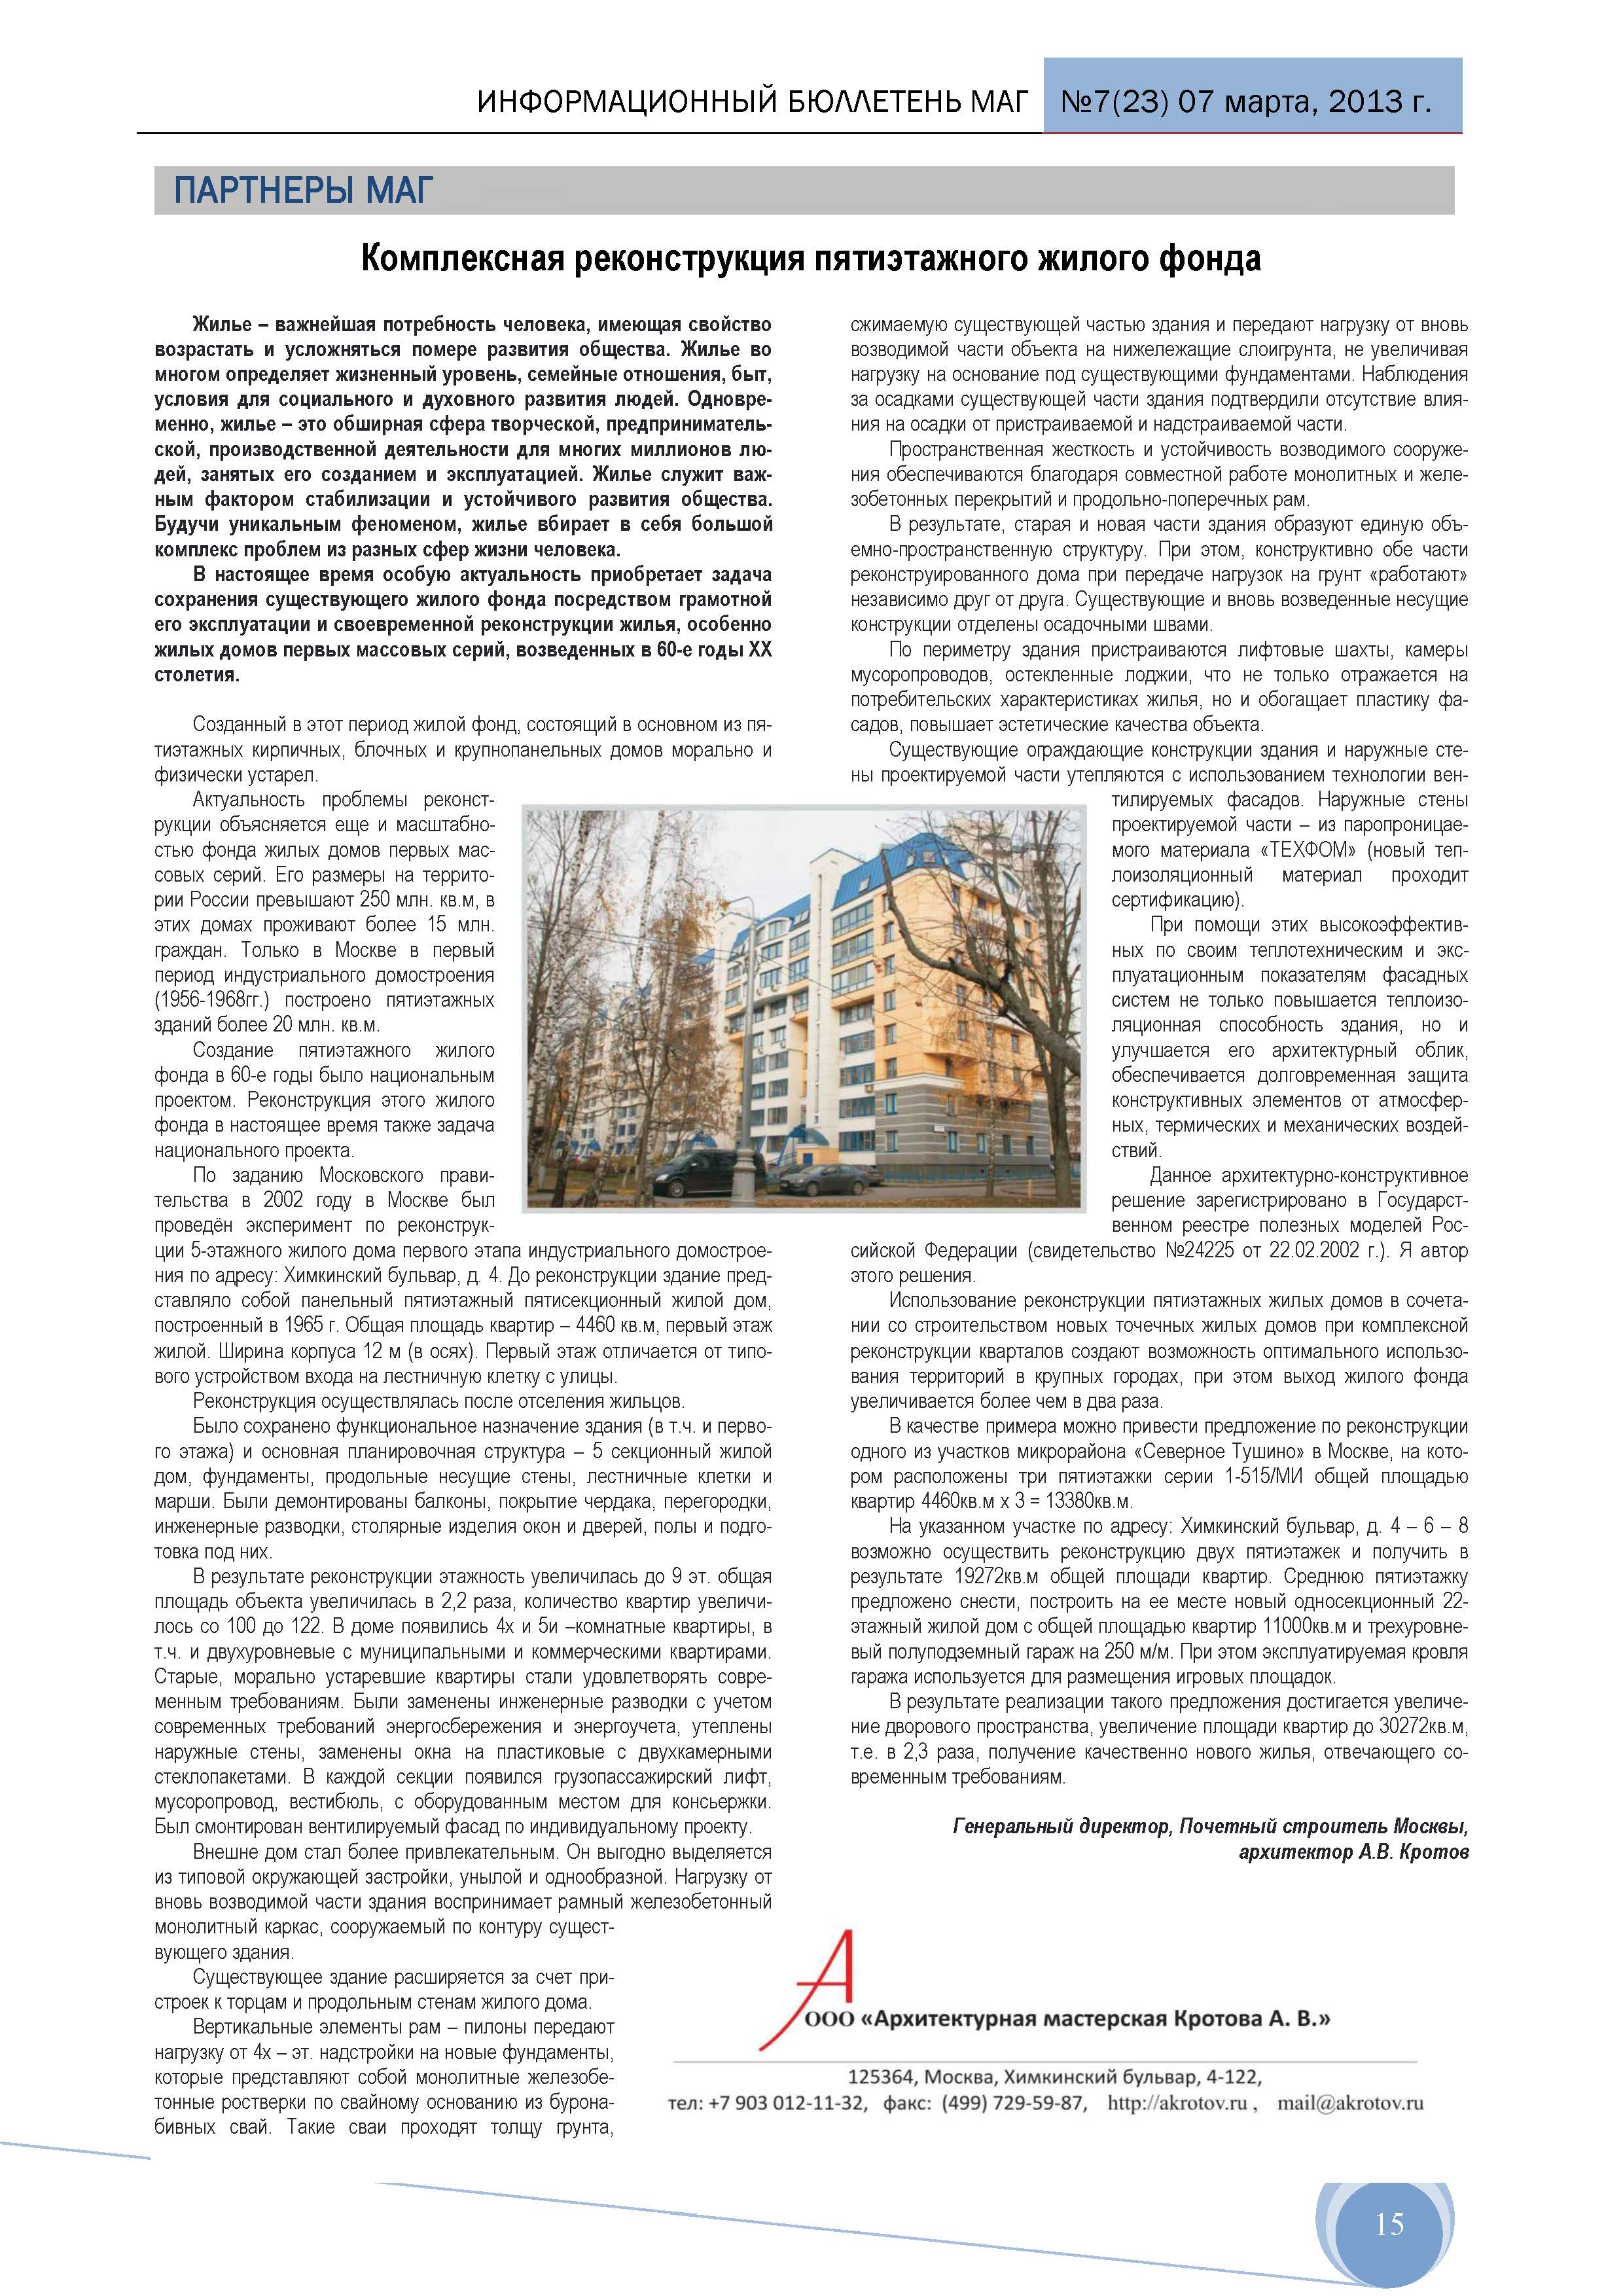 МАГ страница 15